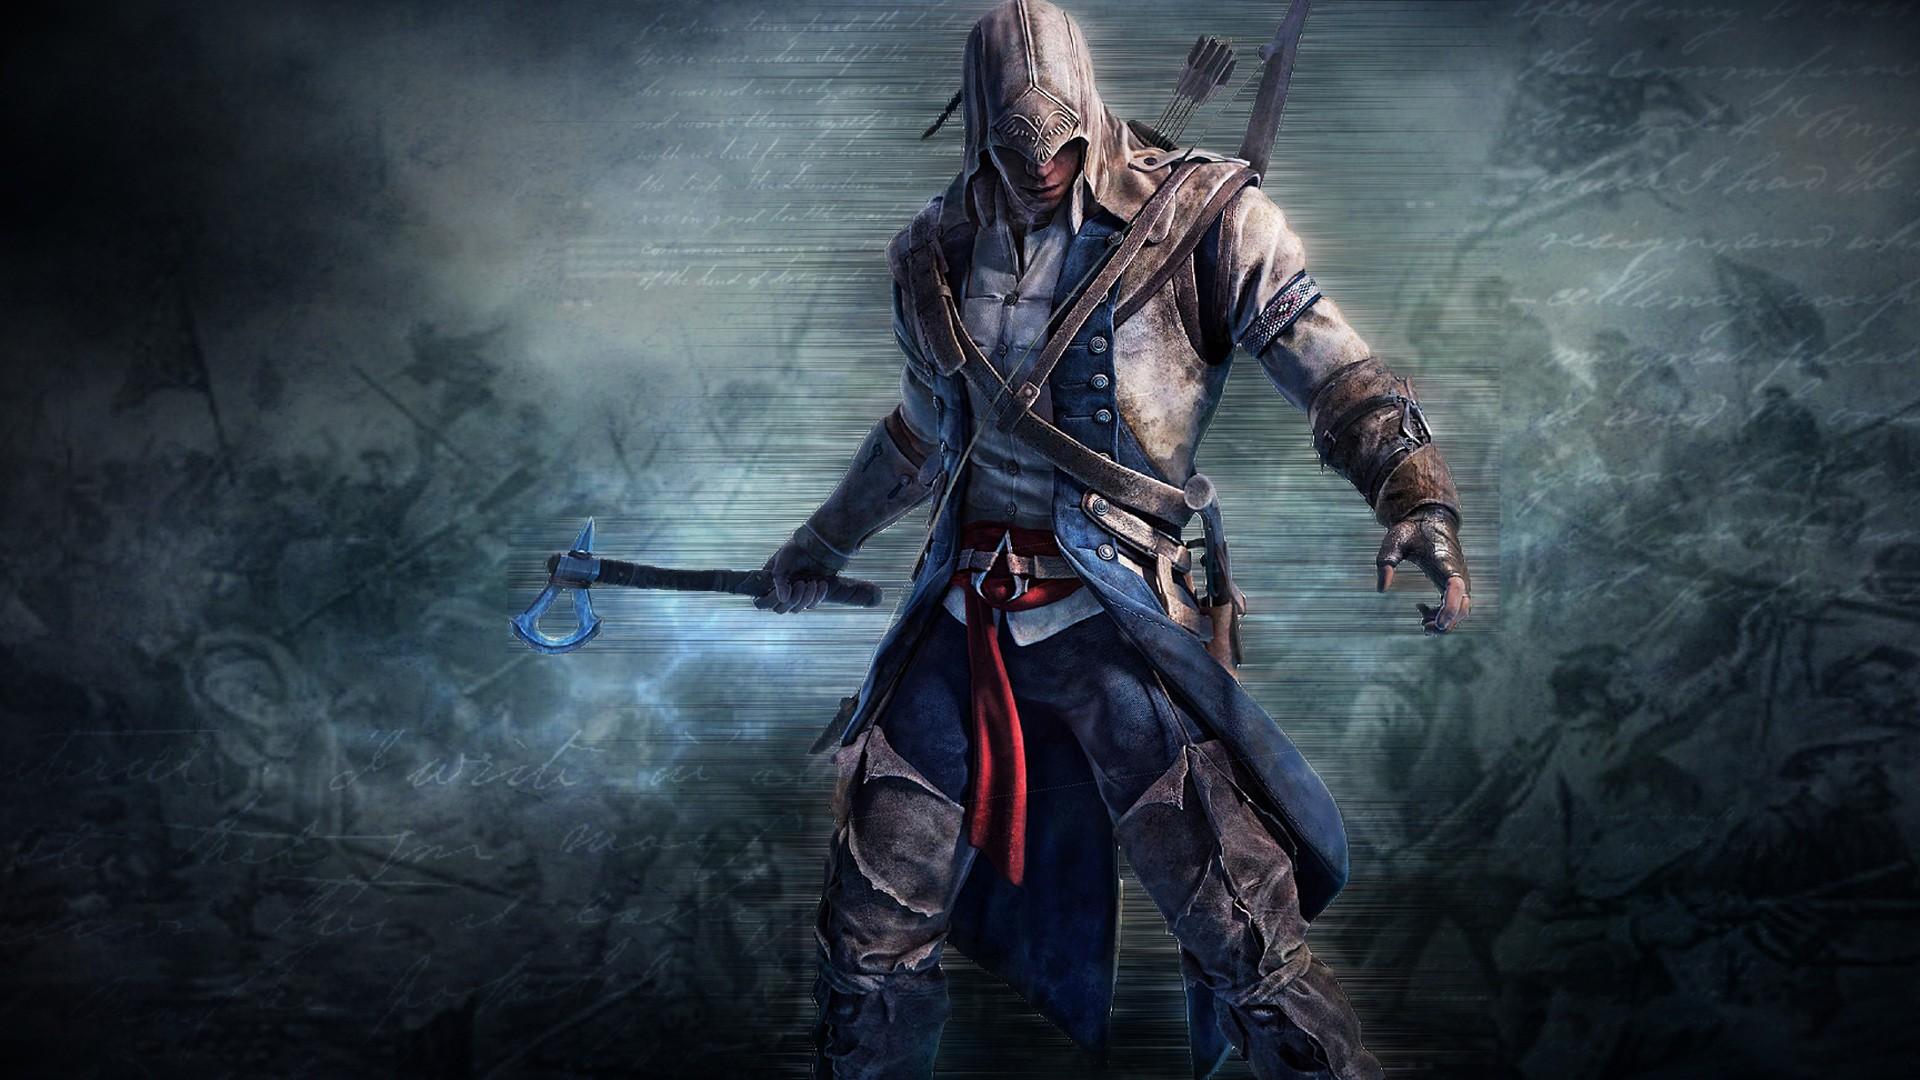 Assassins Creed Wallpaper 1920x1080 Assassins Creed Assassins Creed 1920x1080